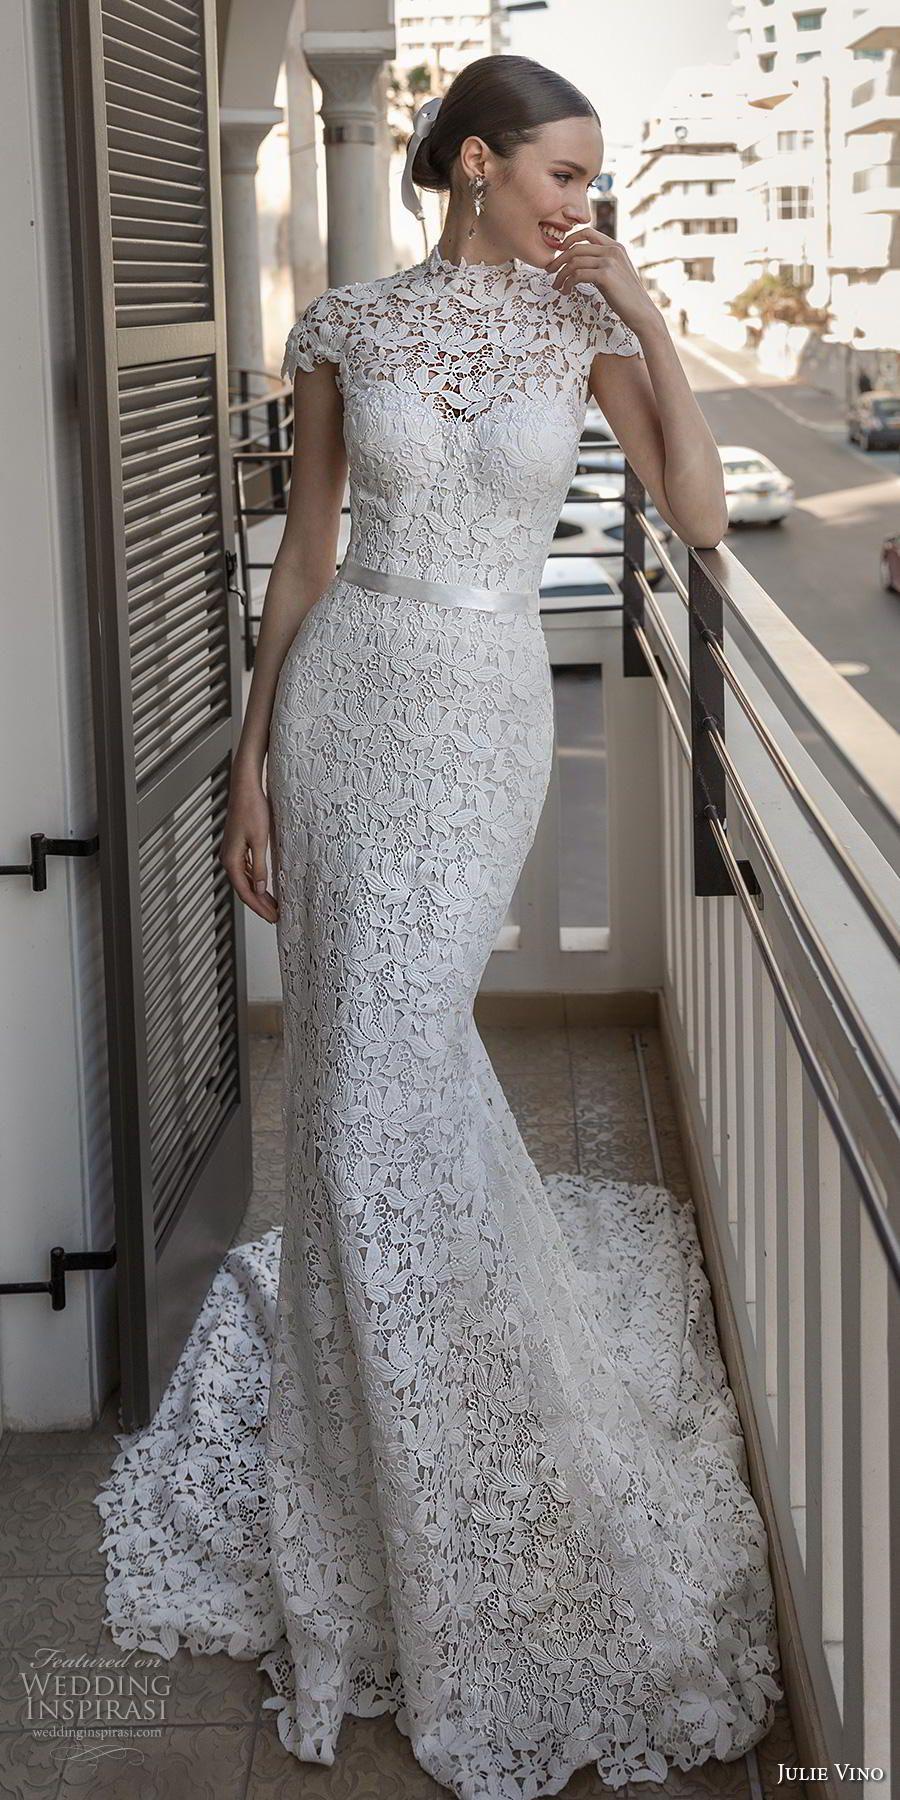 Romanzo By Julie Vino 2020 Wedding Dresses The Royal Bridal Collection Wedding Inspirasi Wedding Dress Cap Sleeves Wedding Dresses Fit And Flare Wedding Dress